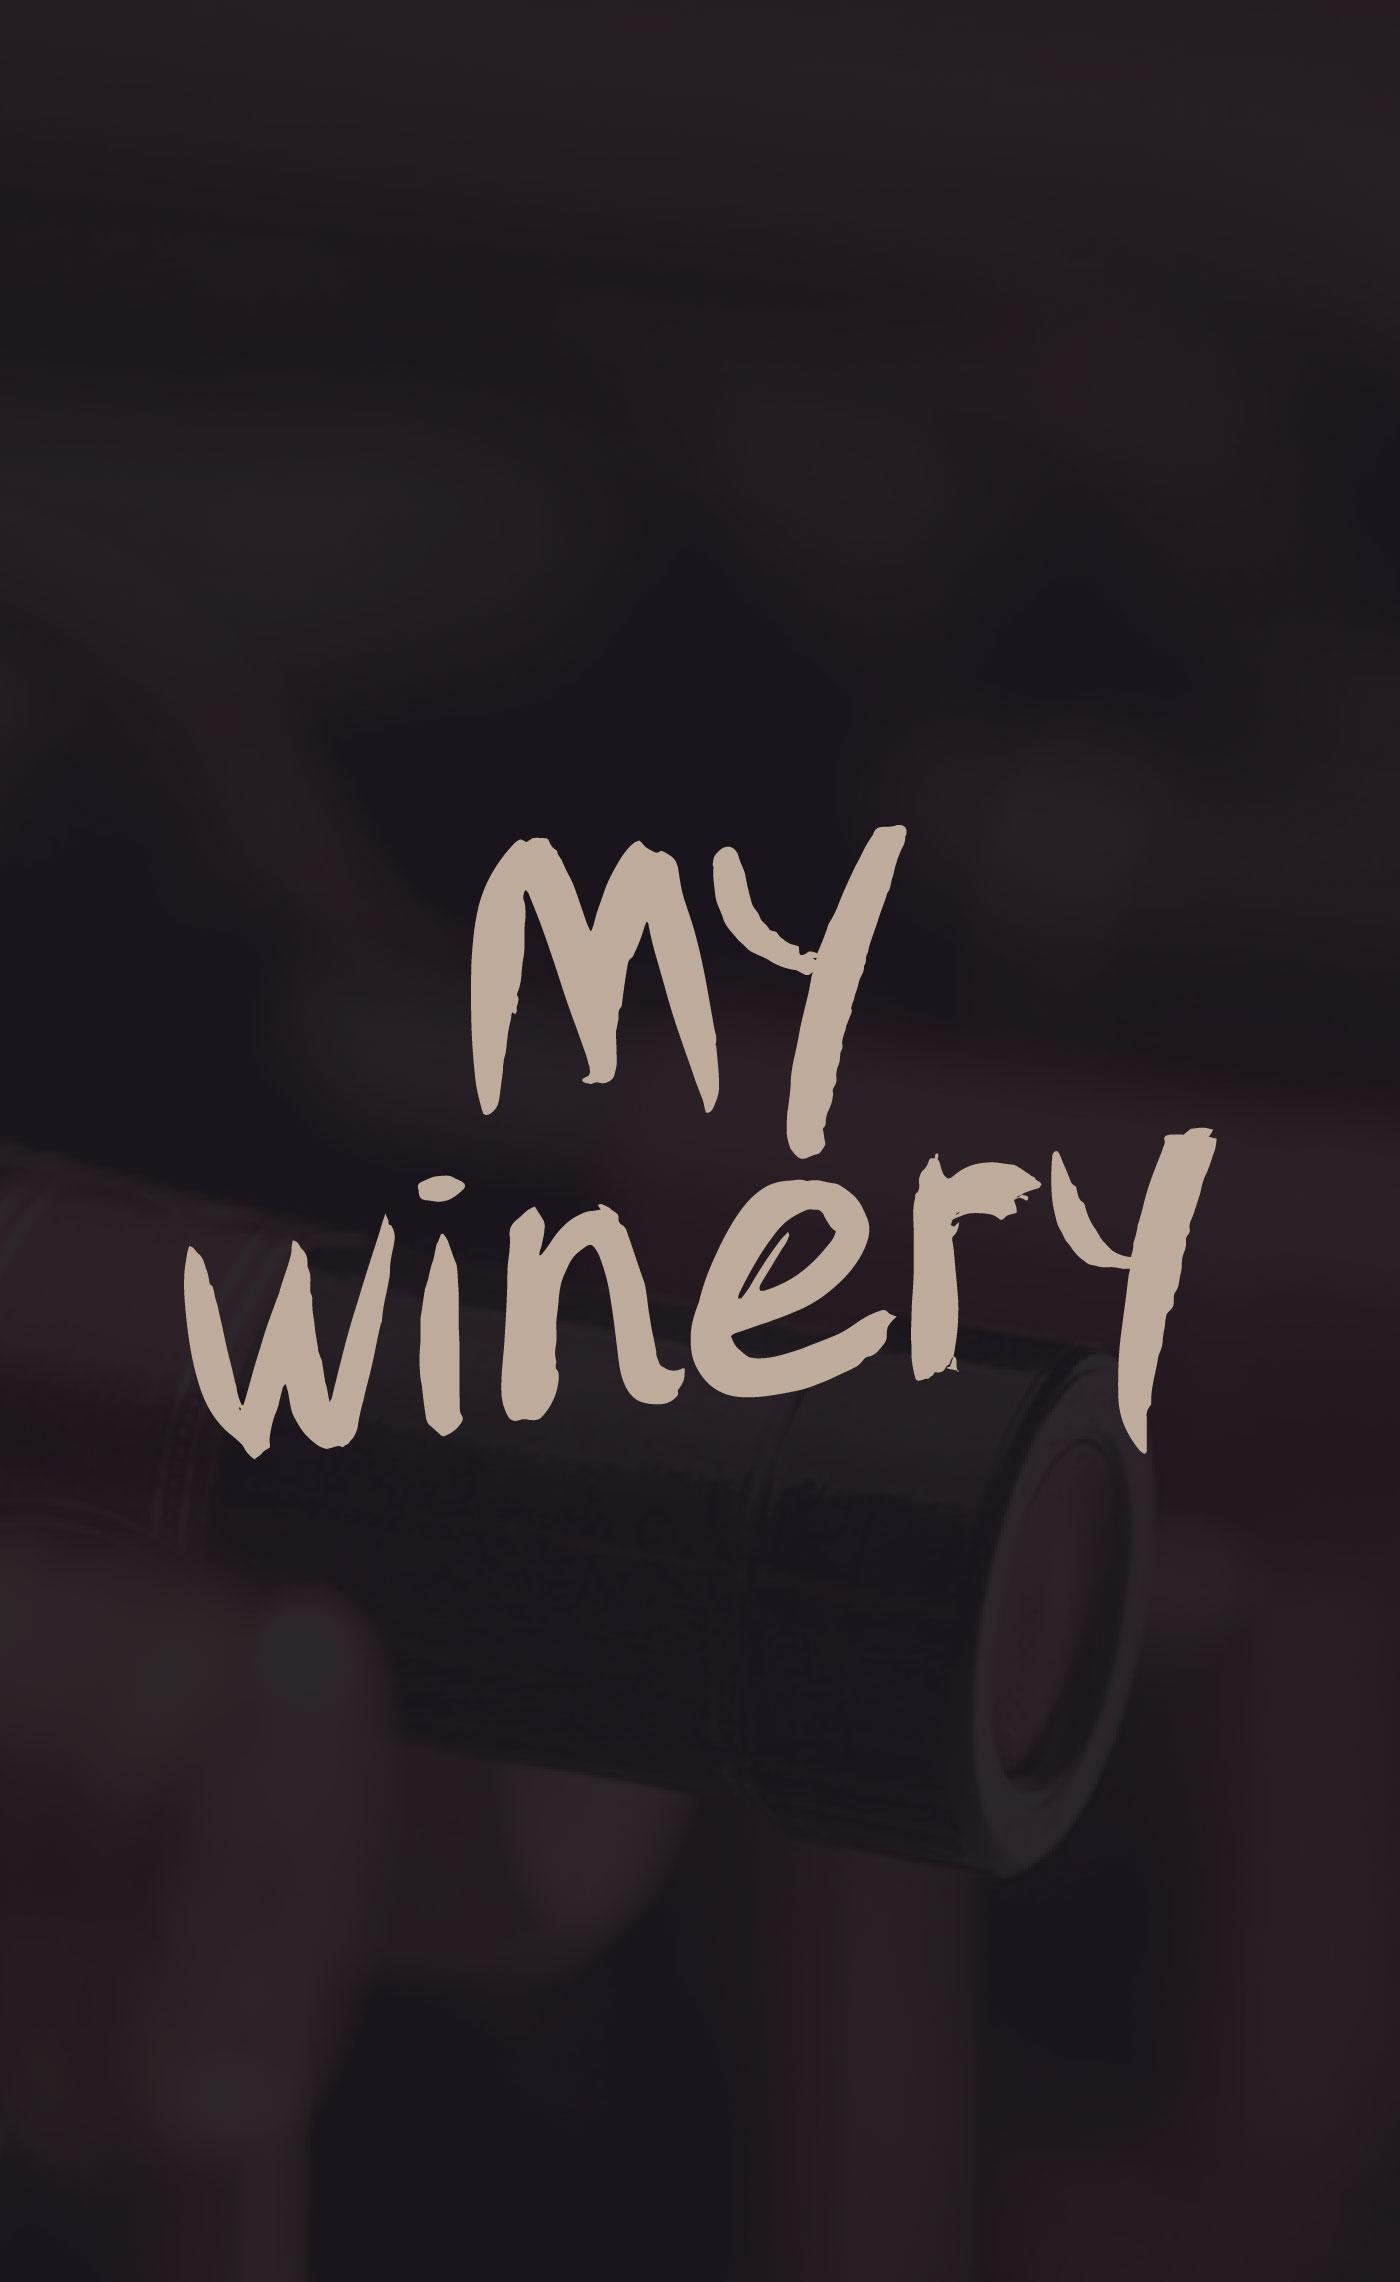 My-Winery-coversite